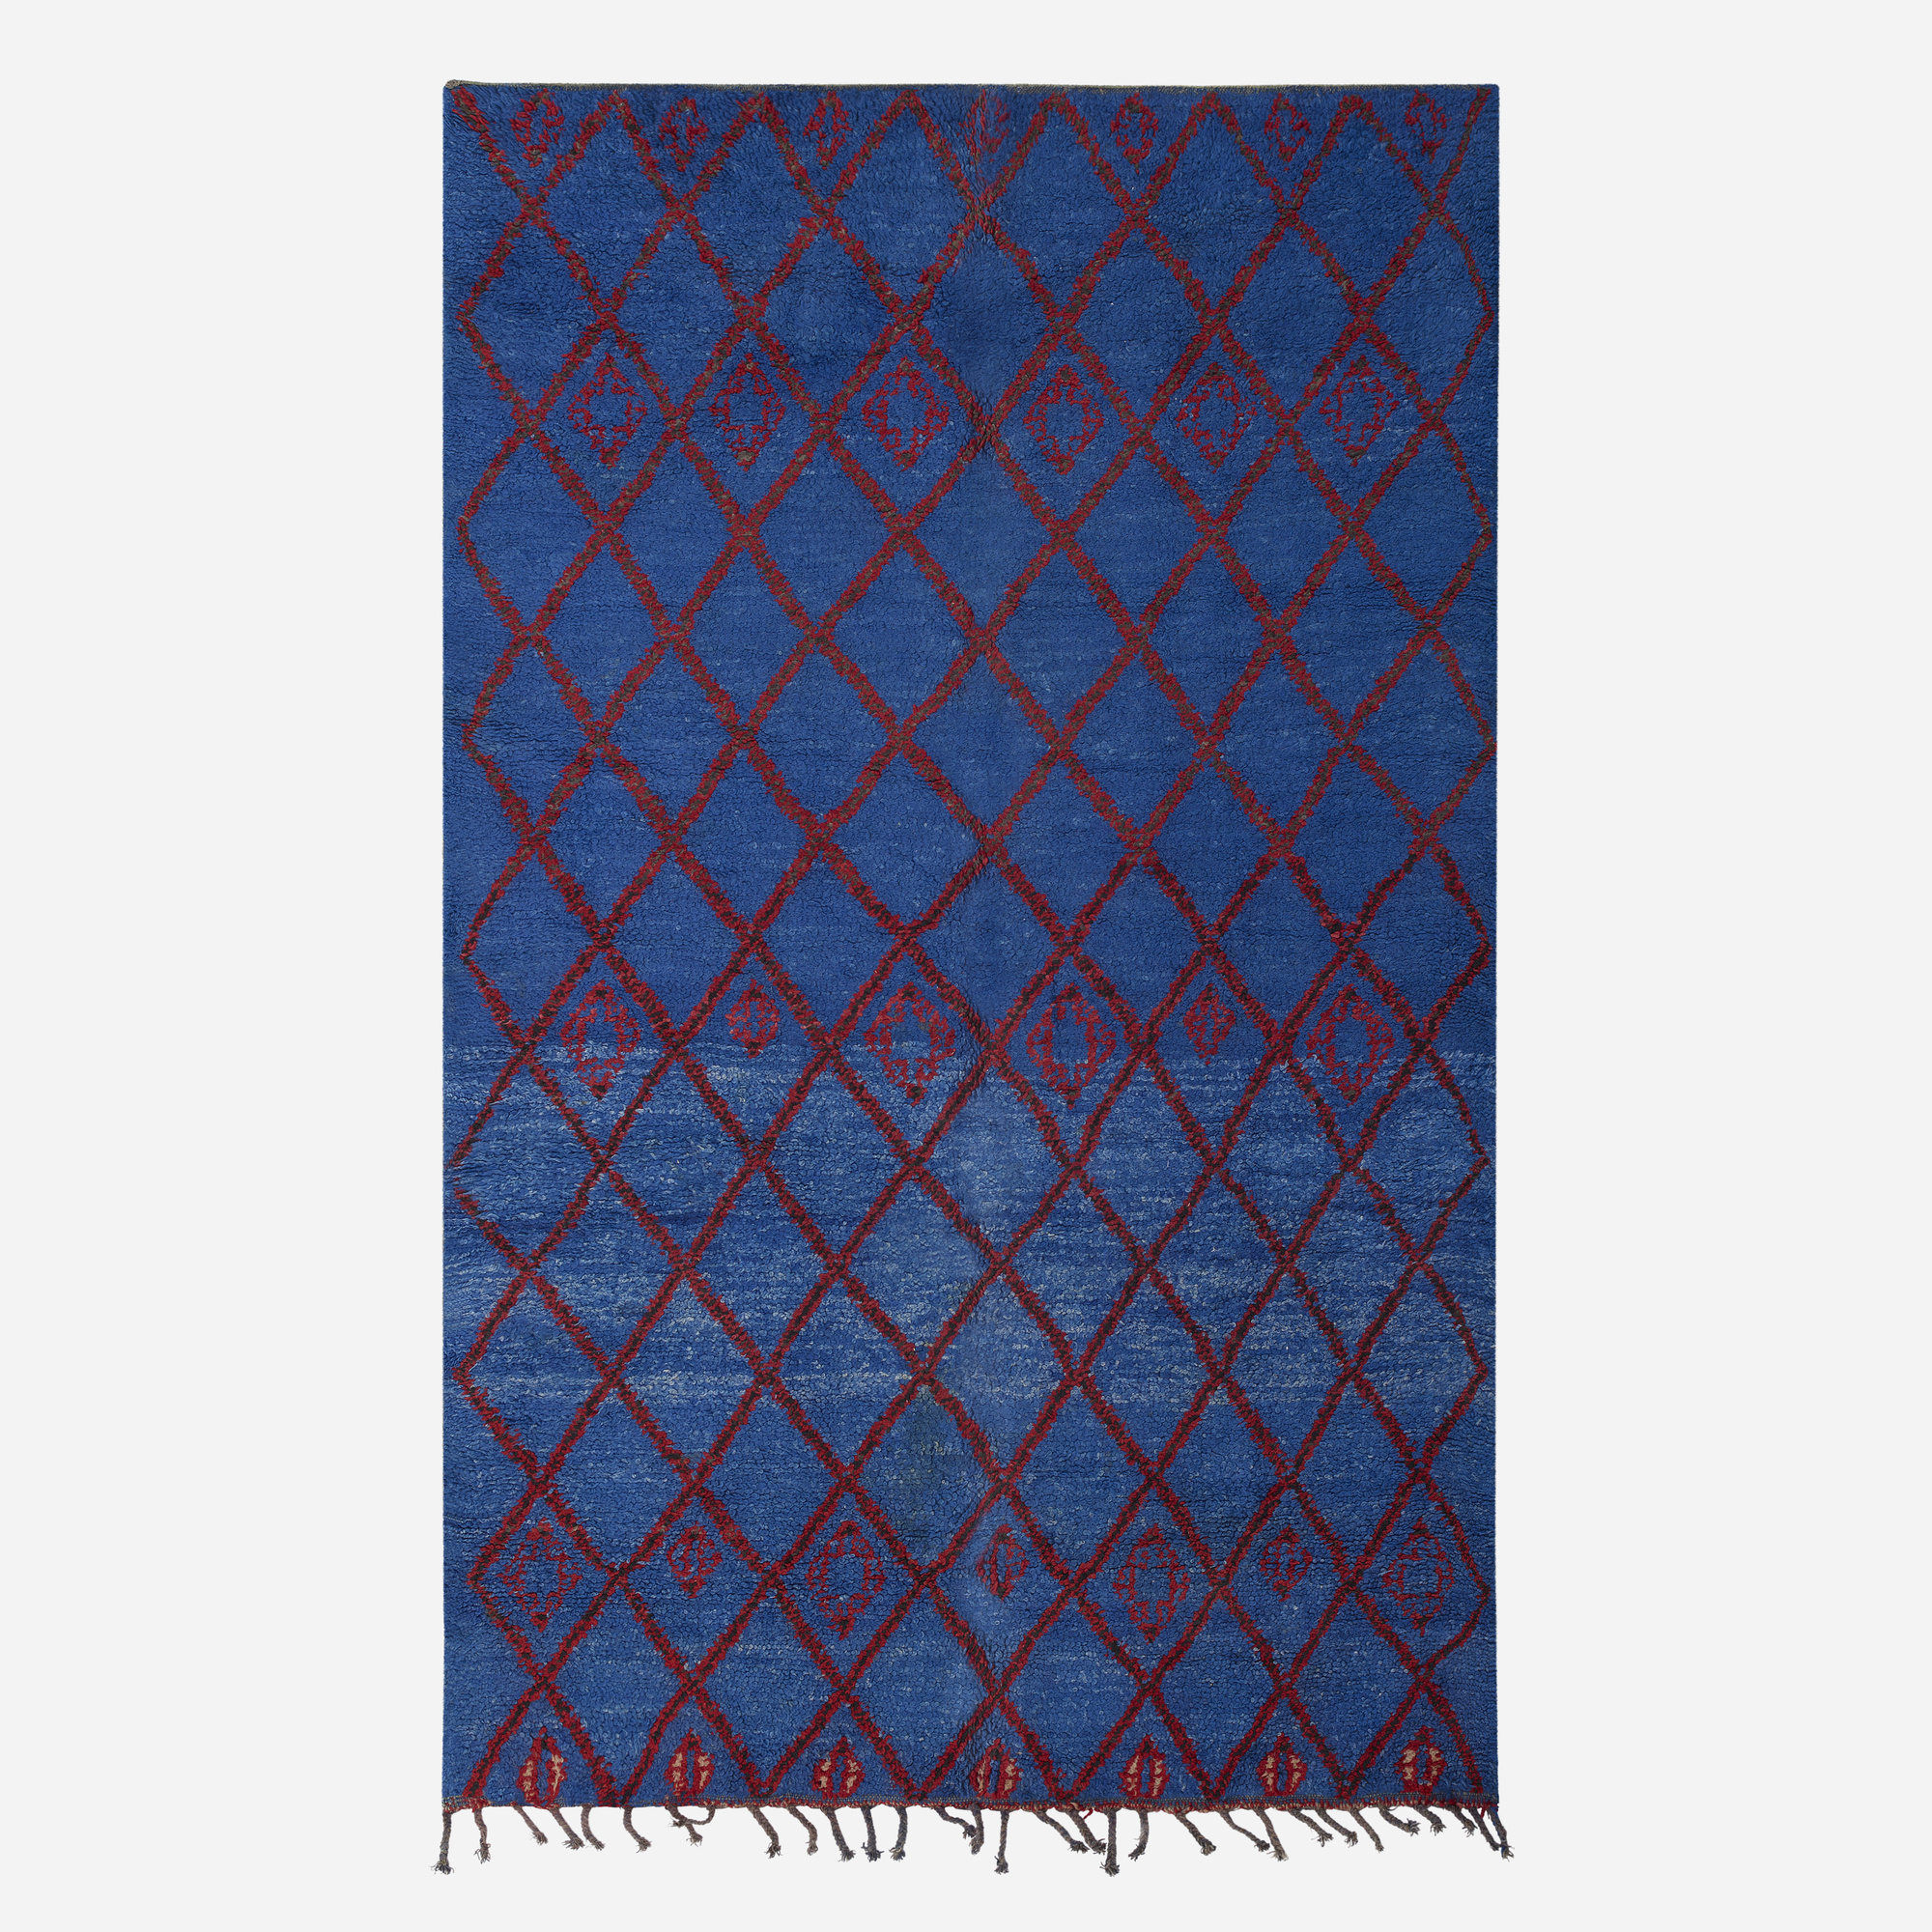 279: Moroccan / pile carpet (1 of 1)